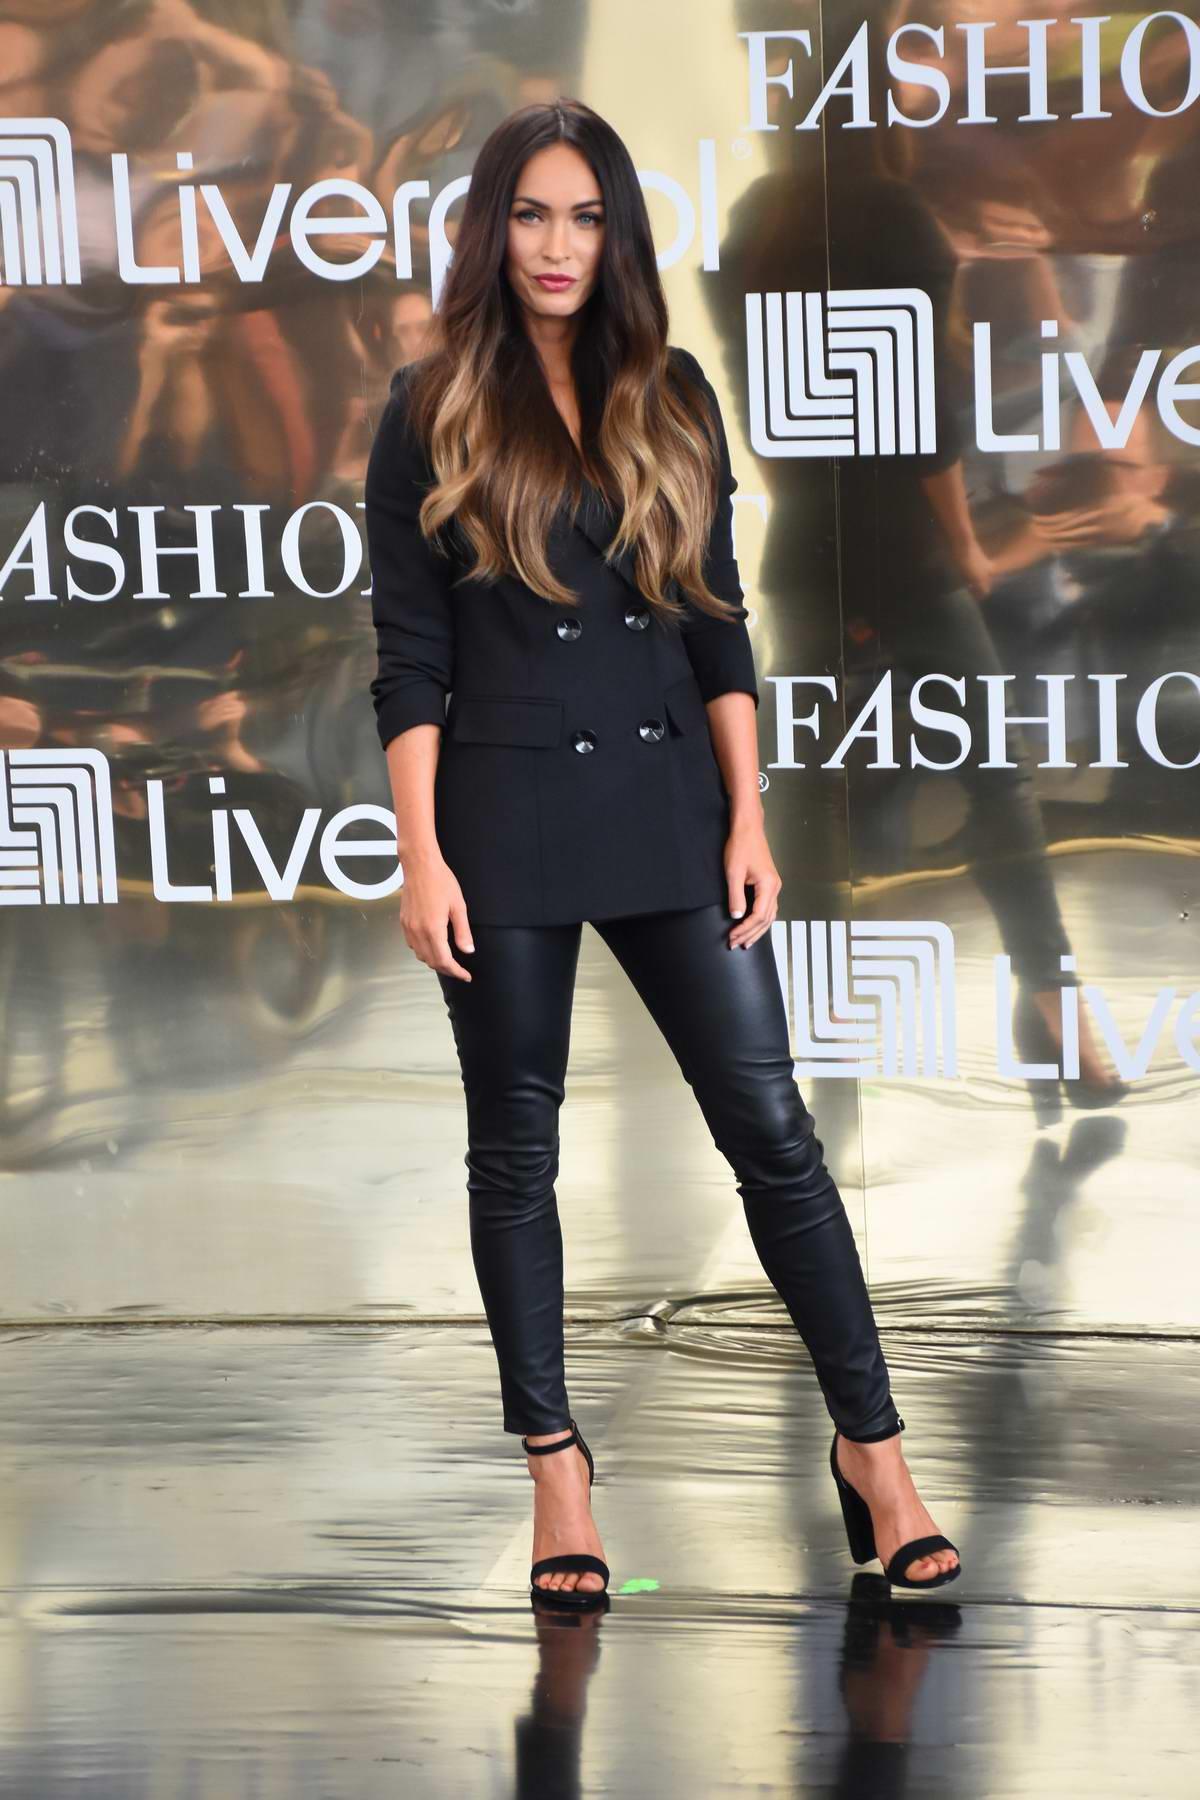 Megan M - Promotional model from Spotlight Agency